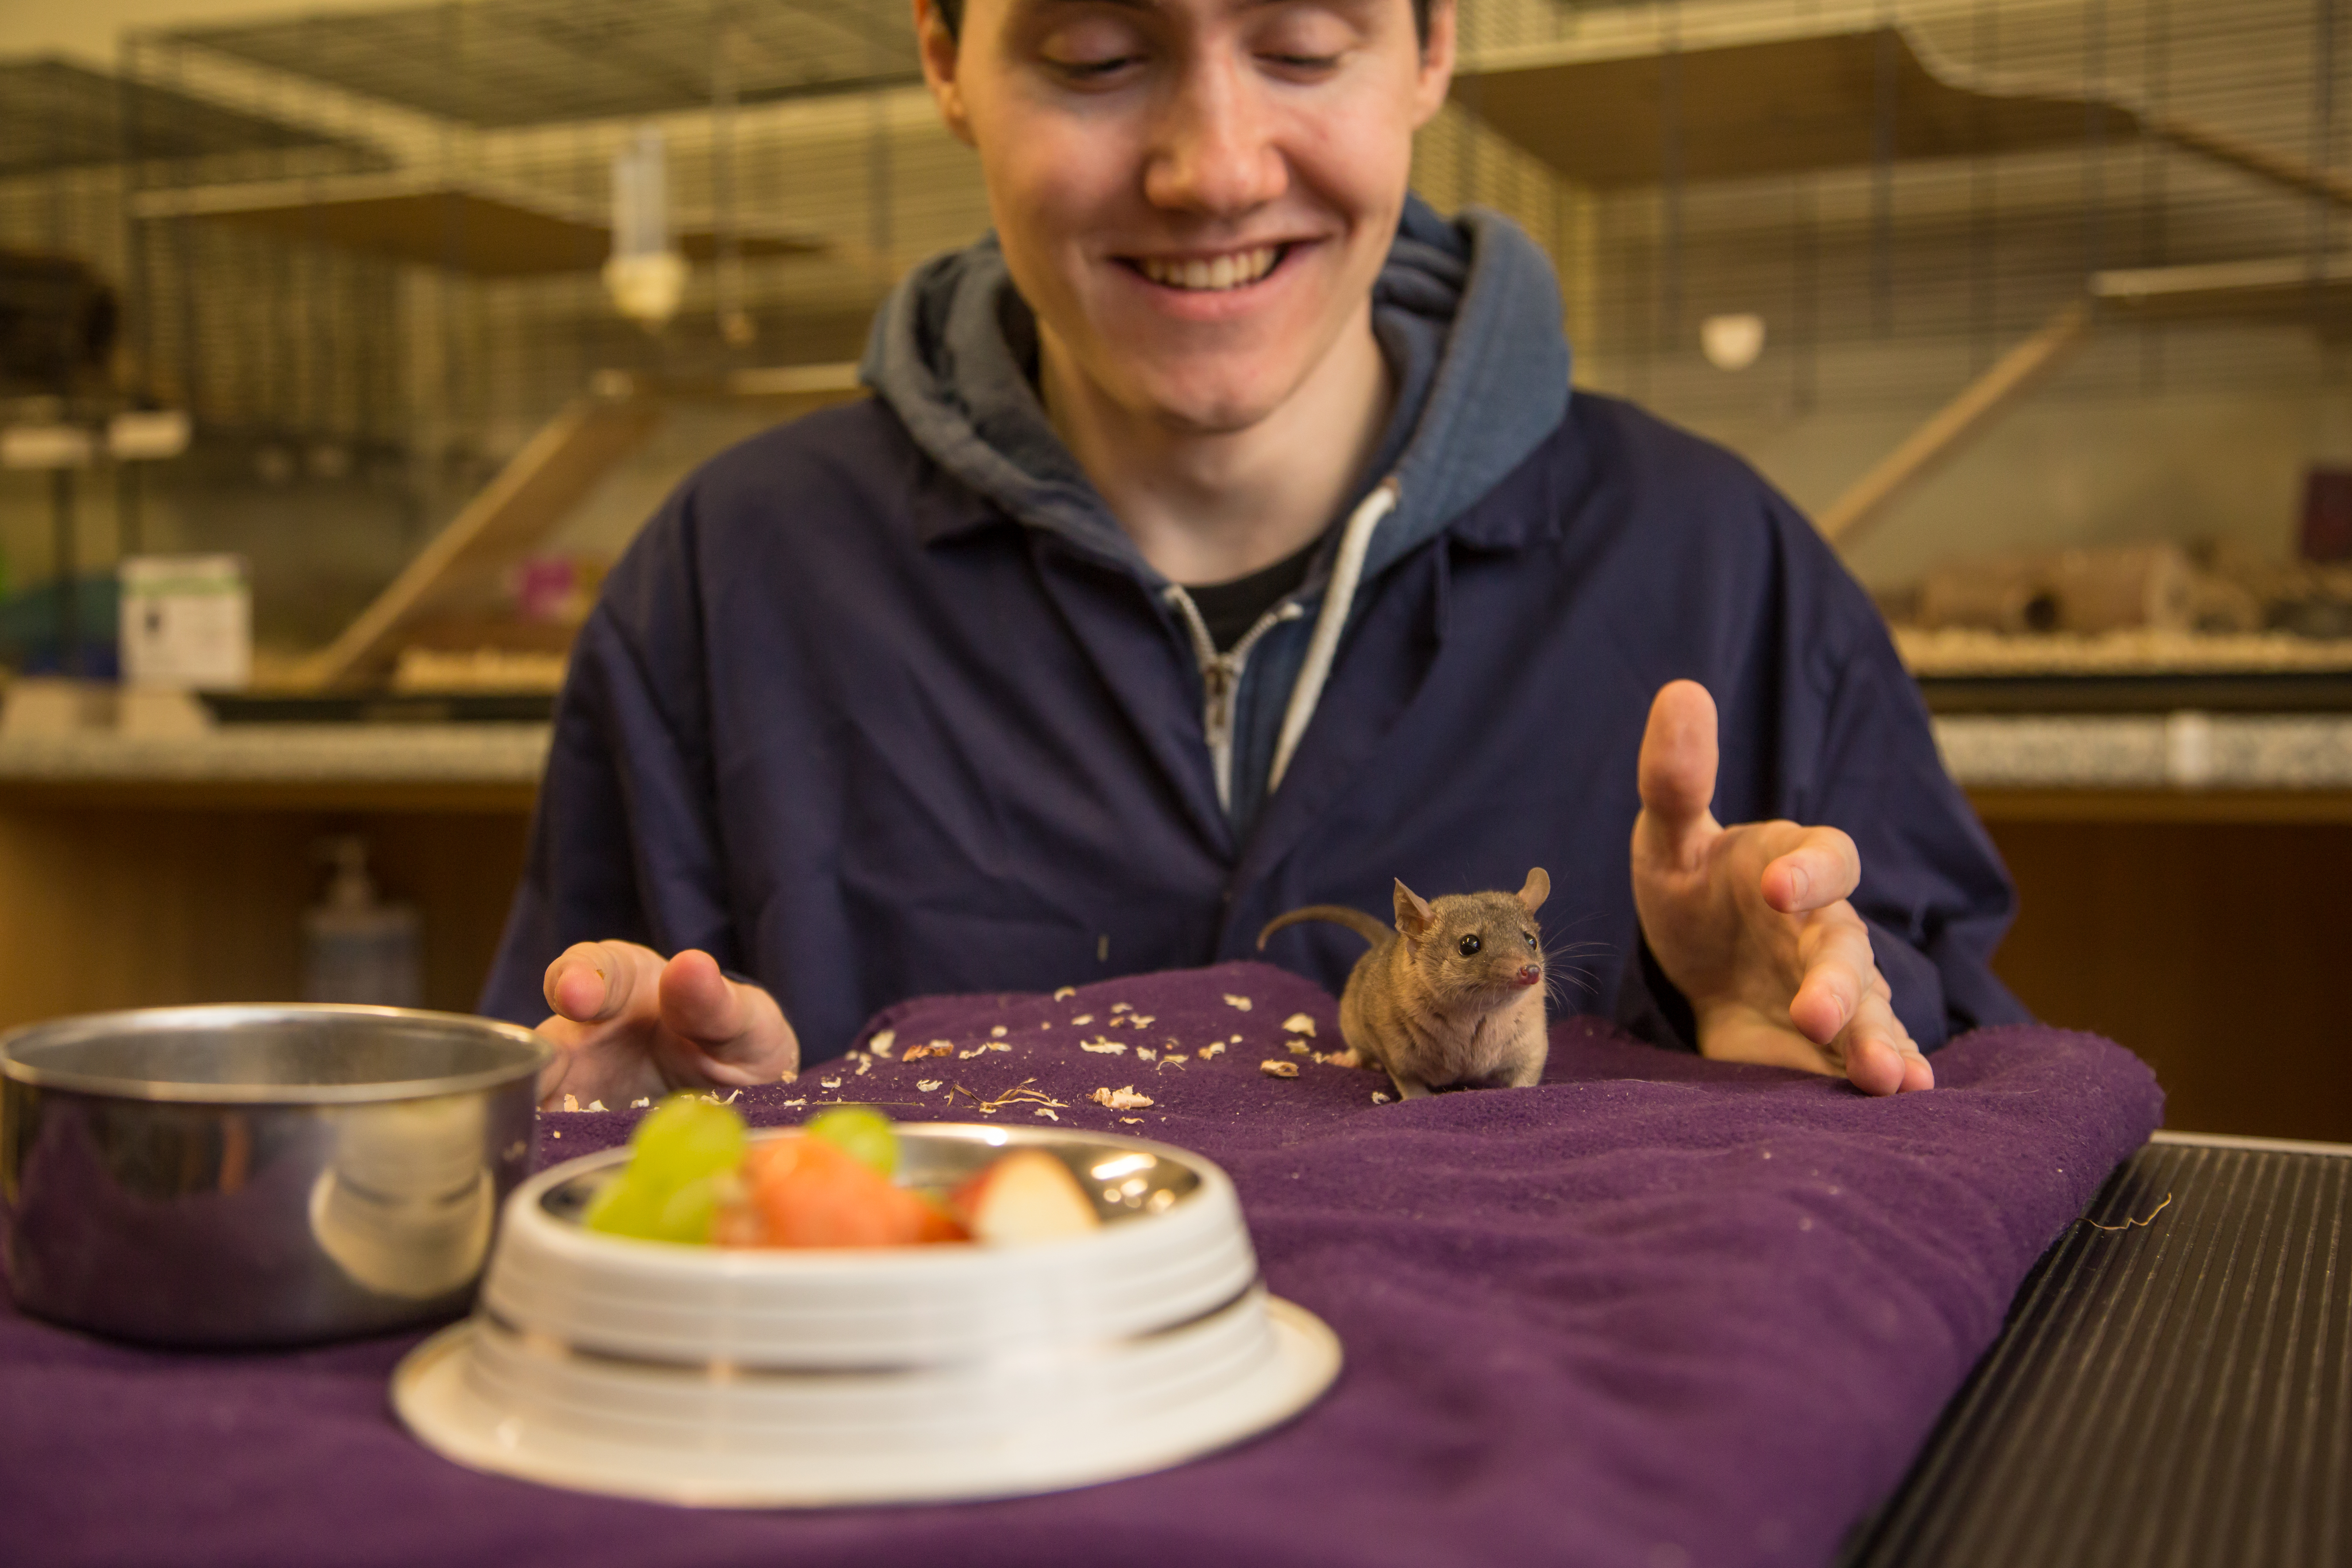 Student feeding small animal.